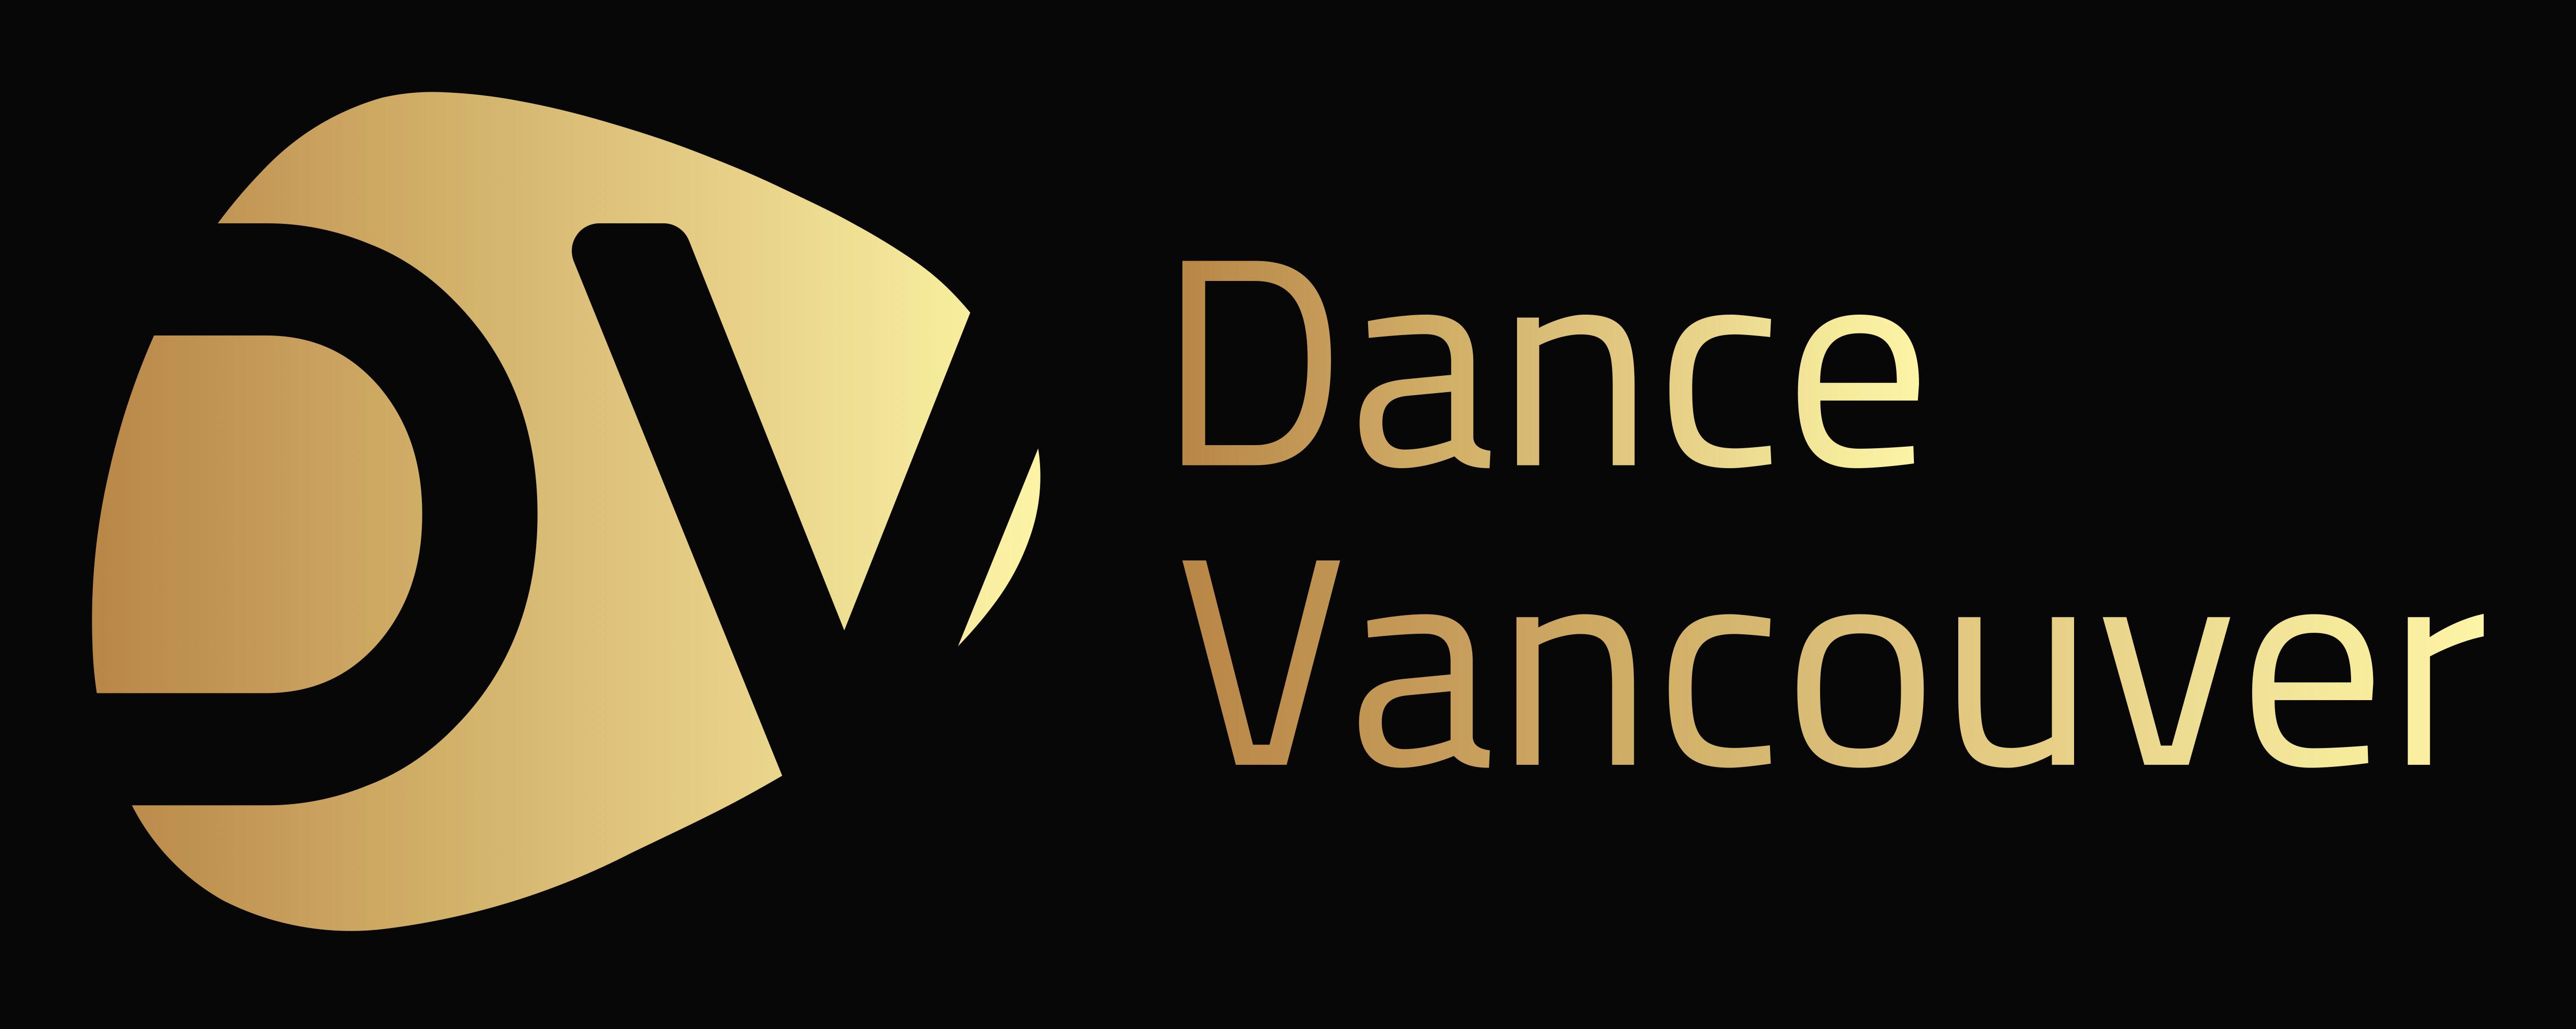 (c) Dancevancouver.ca